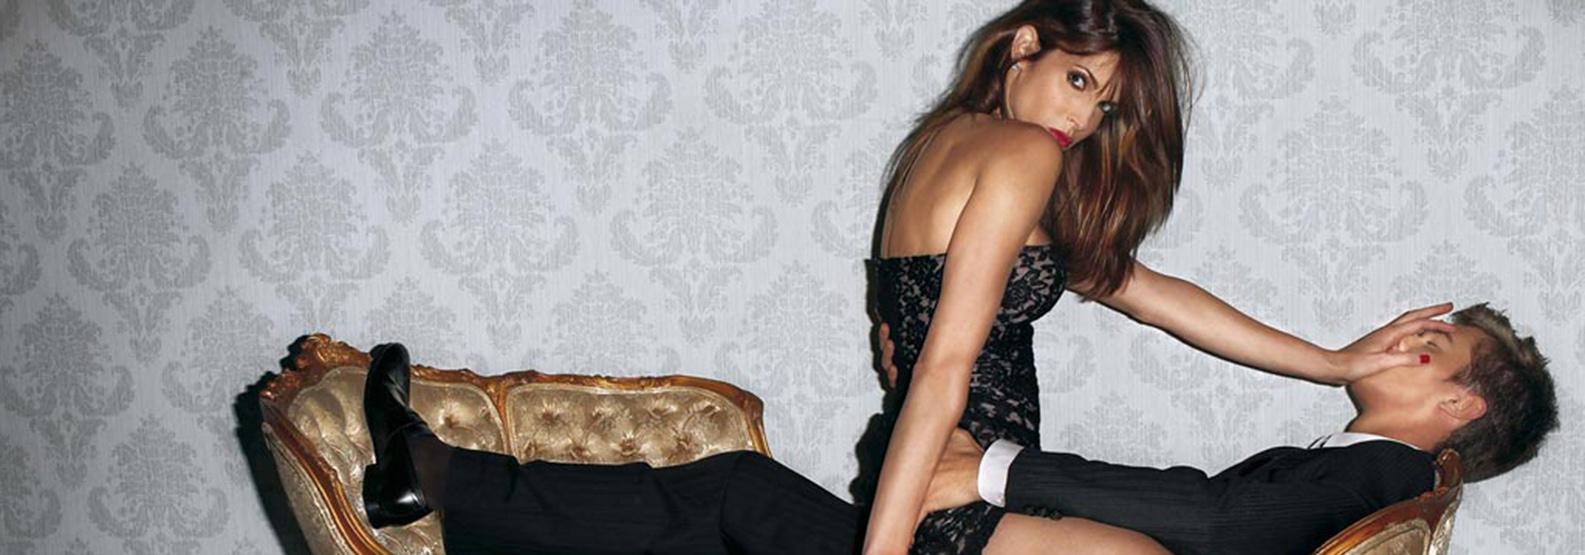 porno-devushki-seksualno-dominiruyut-nad-parnem-devushka-maliki